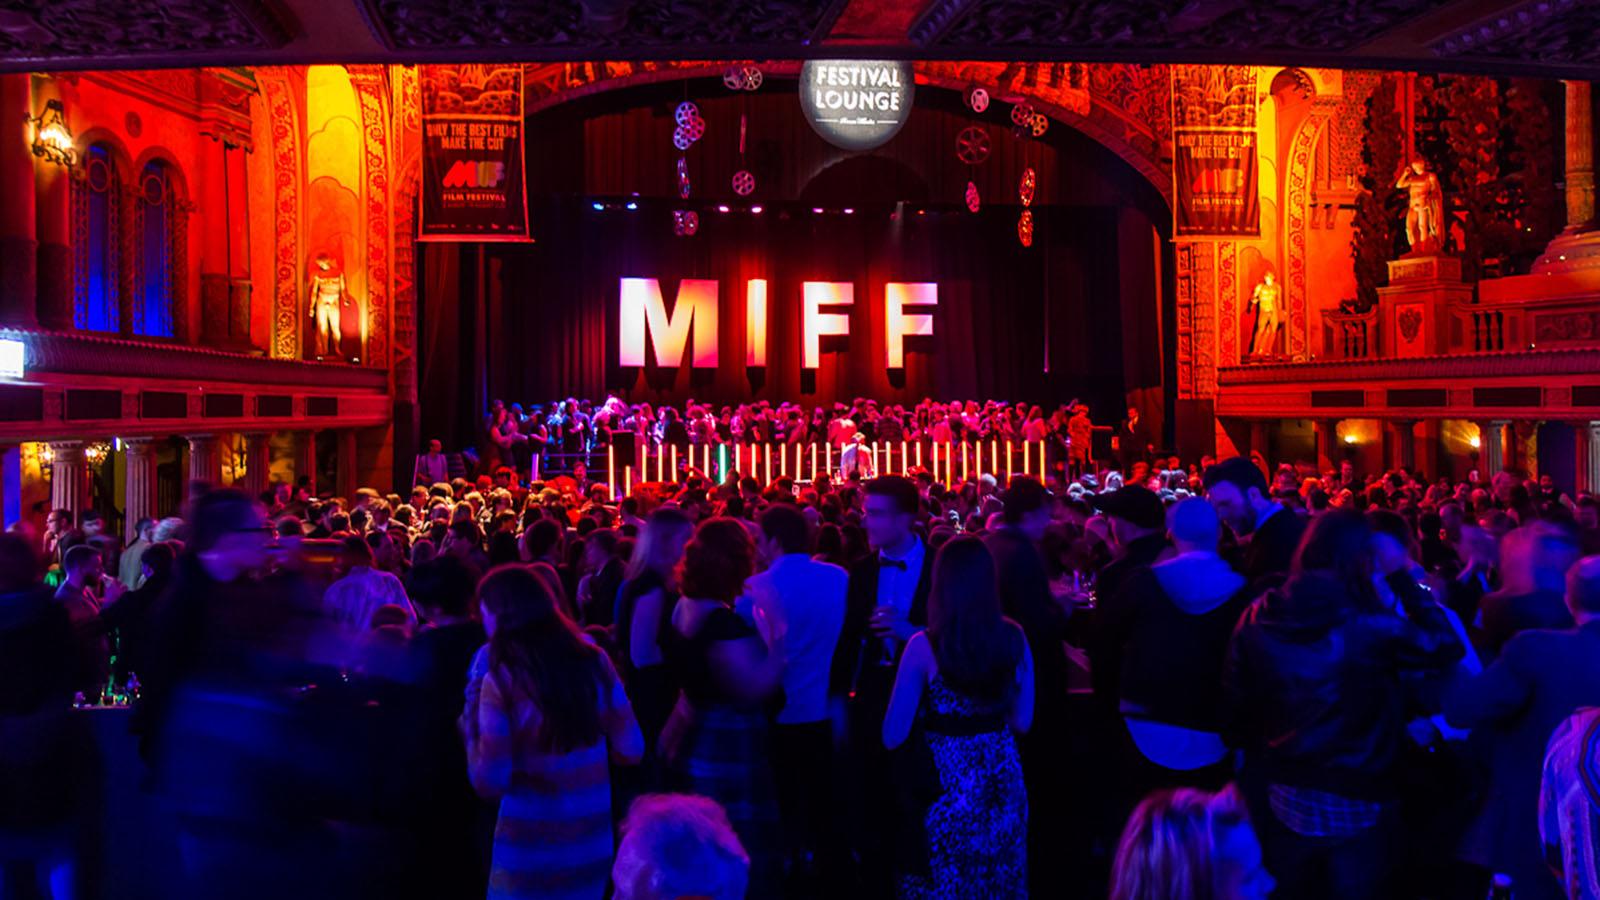 Melbourne International Film Festival, Melbourne, Victoria, Australia